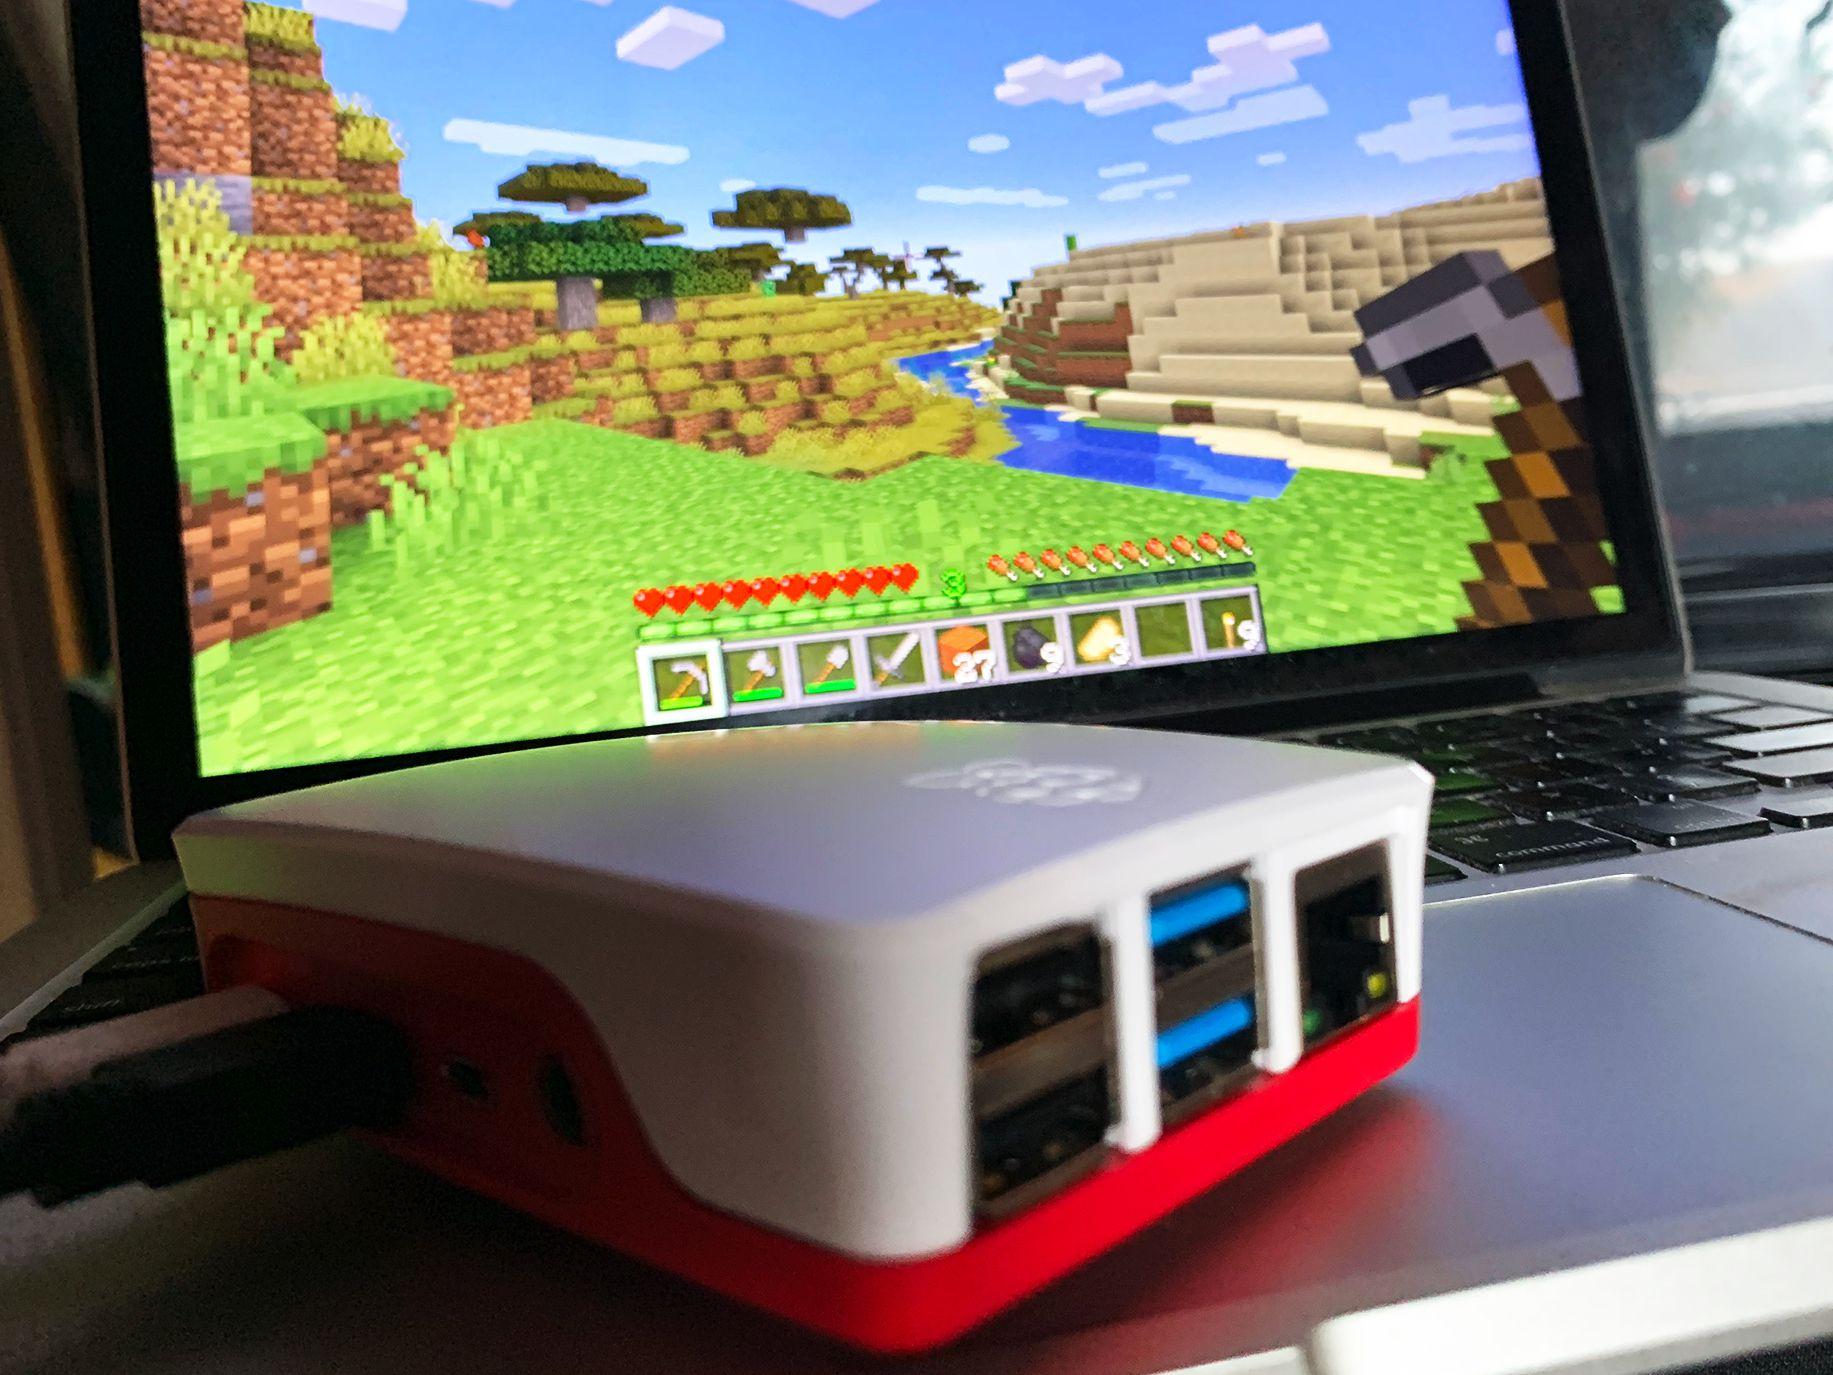 How to Create a Minecraft Server Using Raspberry Pi